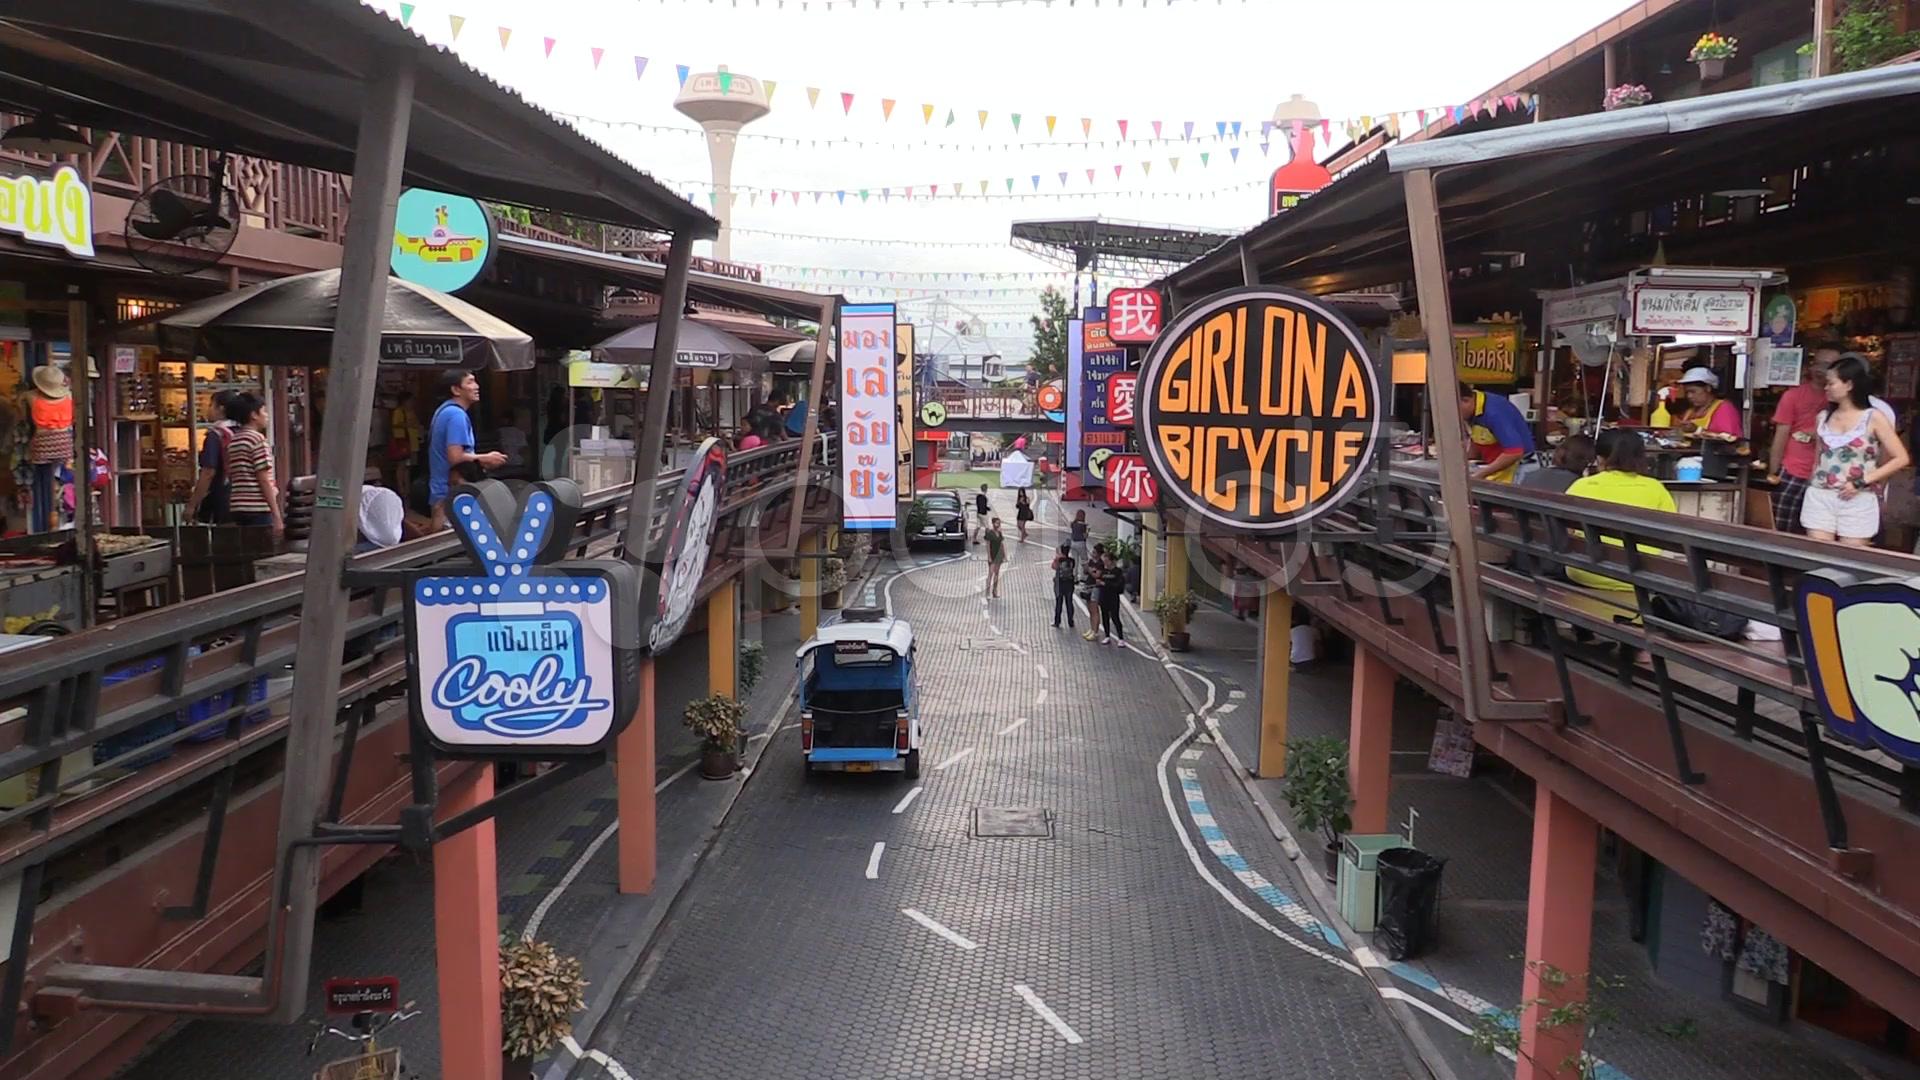 Image source:https://www.pond5.com/stock-footage/34809553/plearn-wan-vintage-village-hua-hin-thailand.html